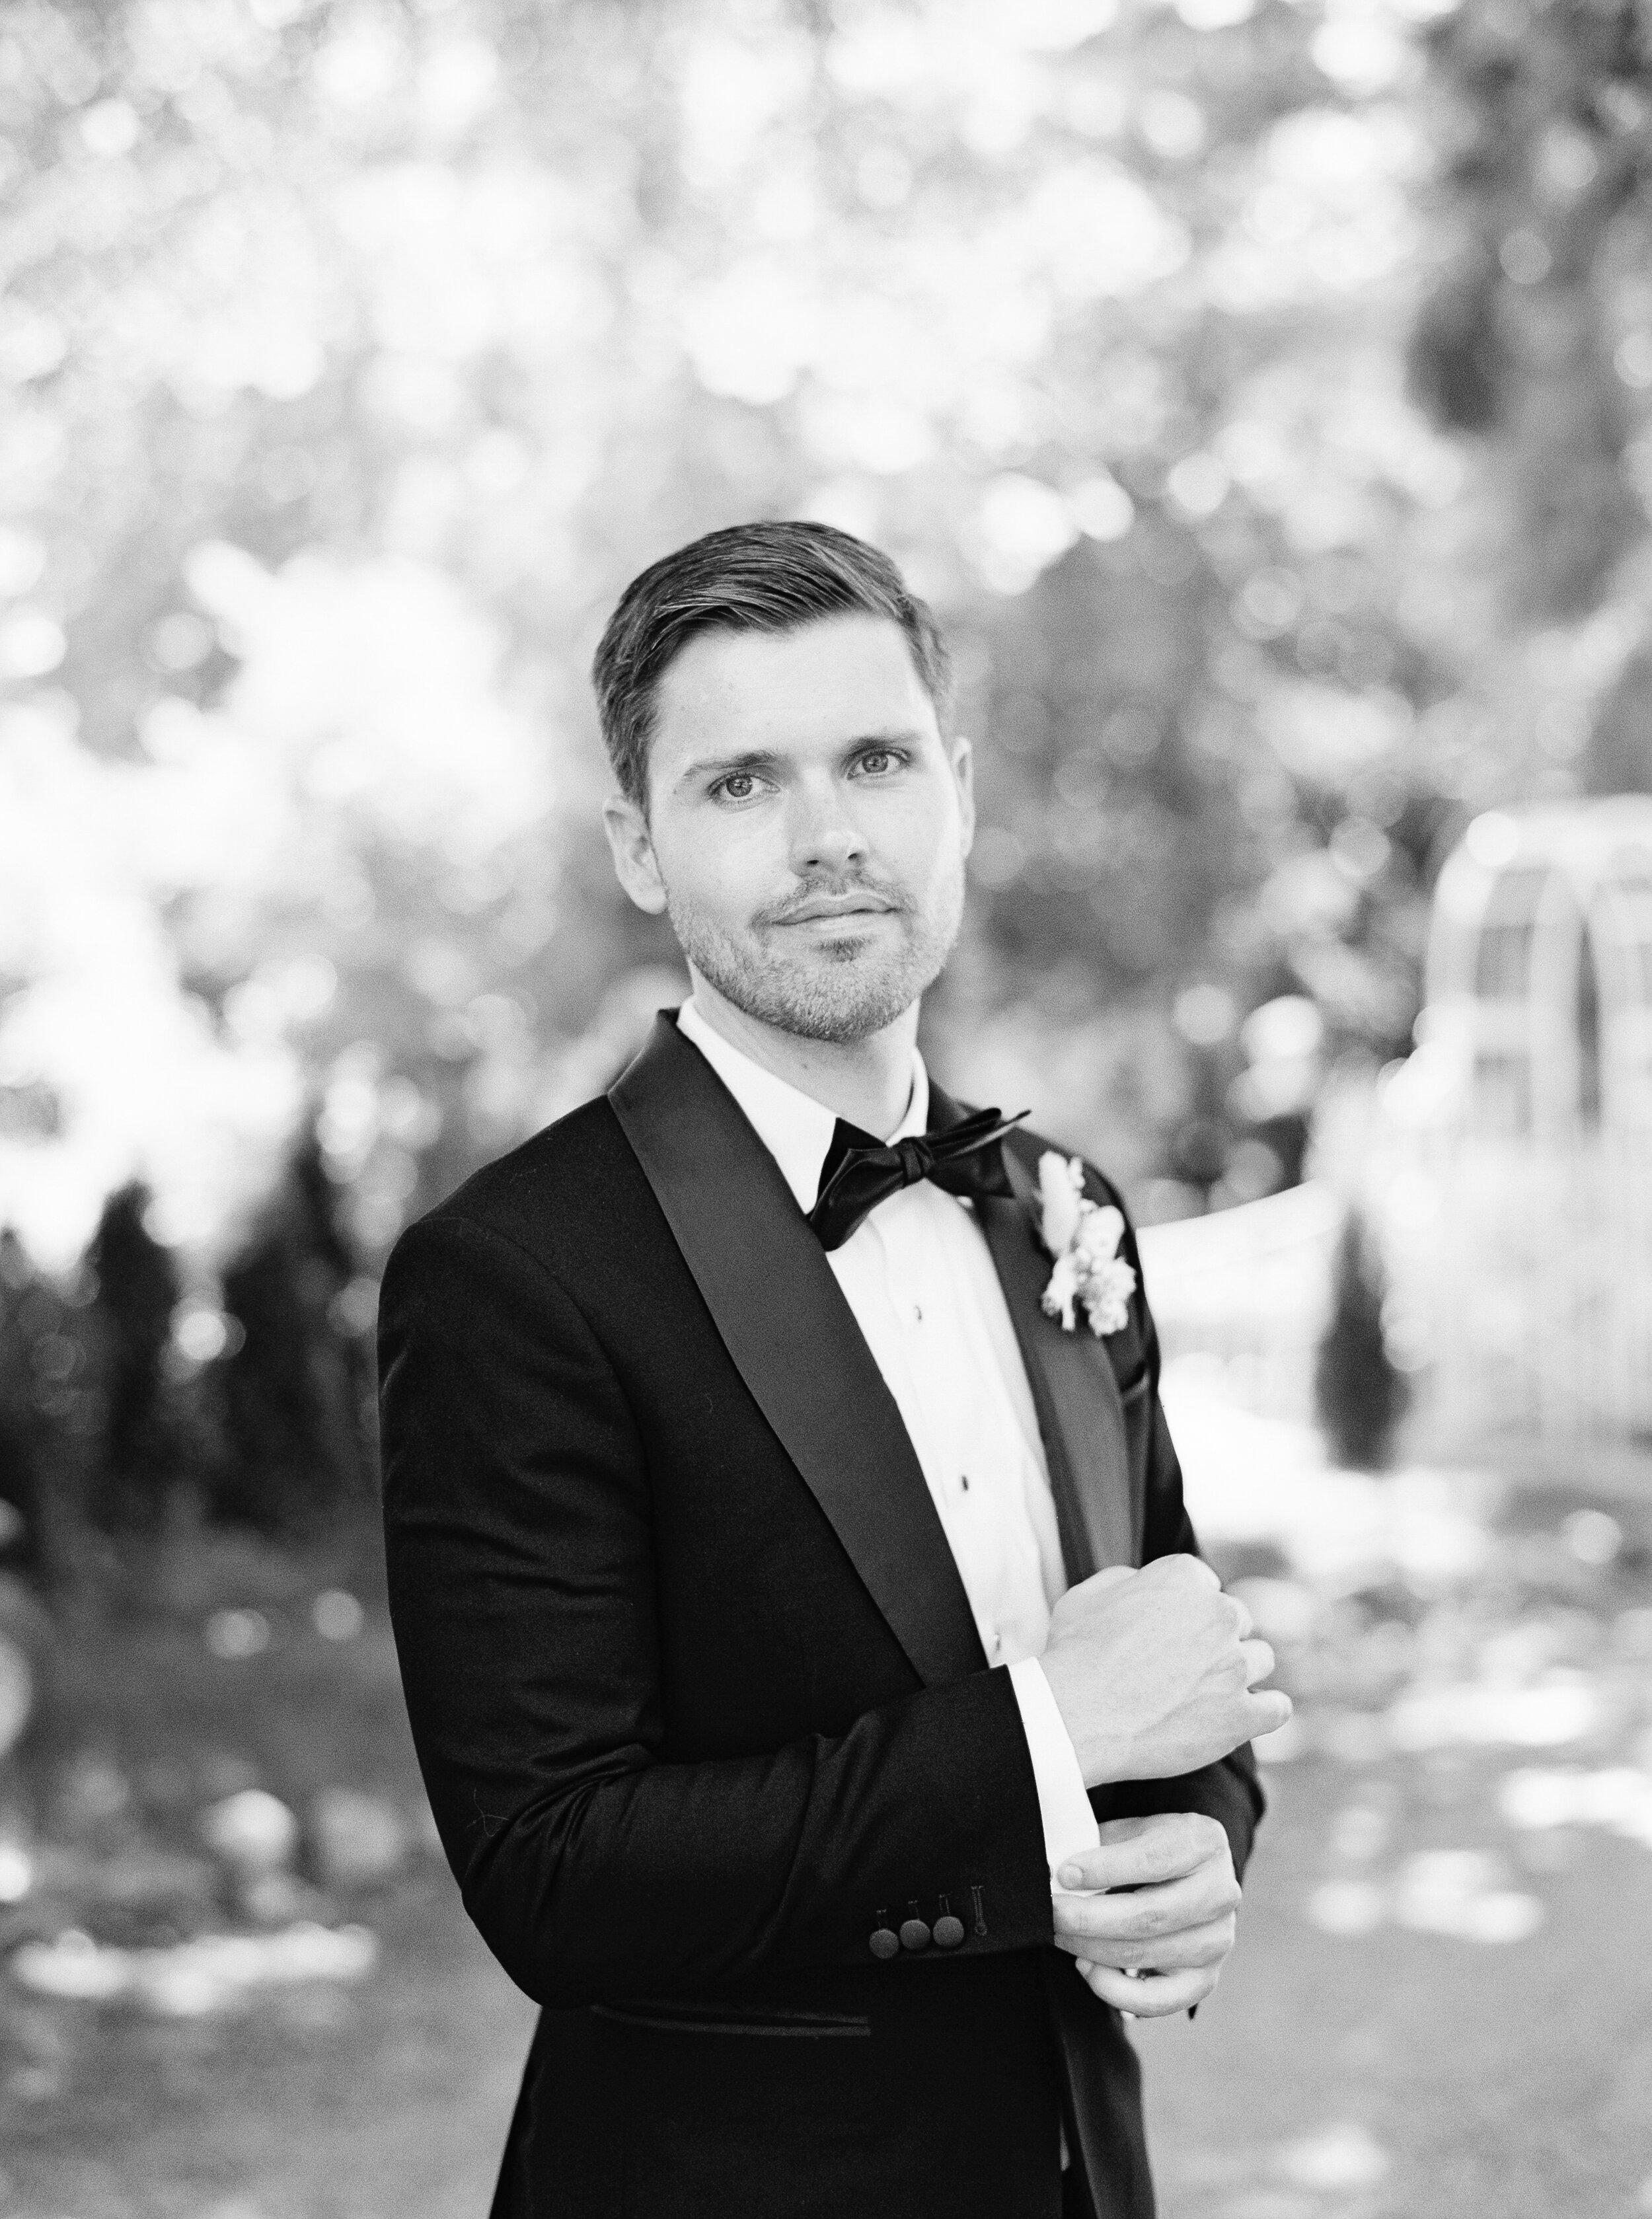 gracewood-kurtz-best-toronto-wedding-photographer-soft-airy-jordan-andrew-previews-14.jpg